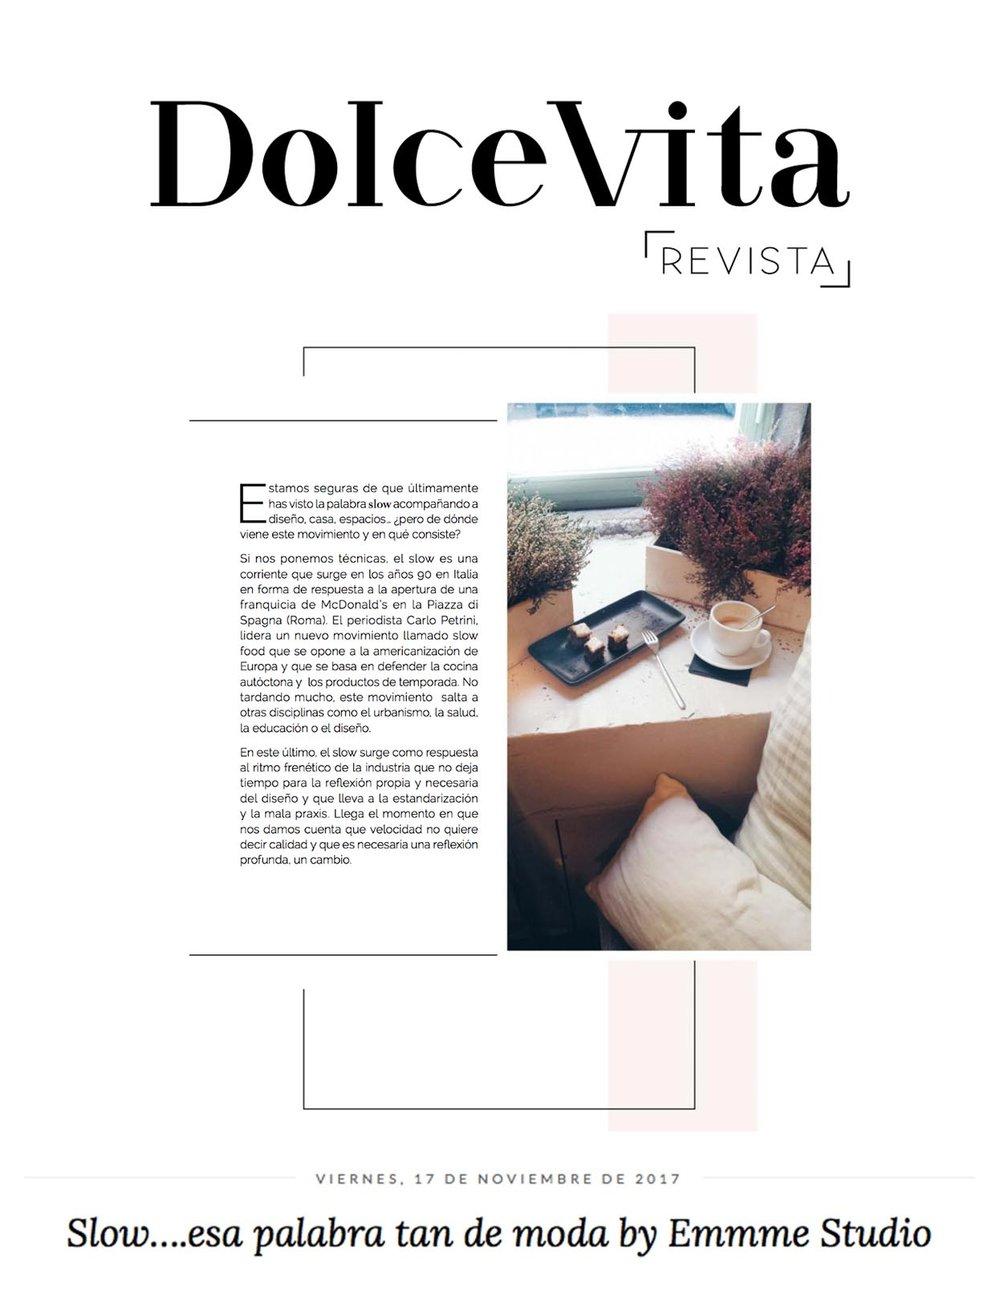 emmme studio dolcevita reformas diseño slow prensa articulo.jpg